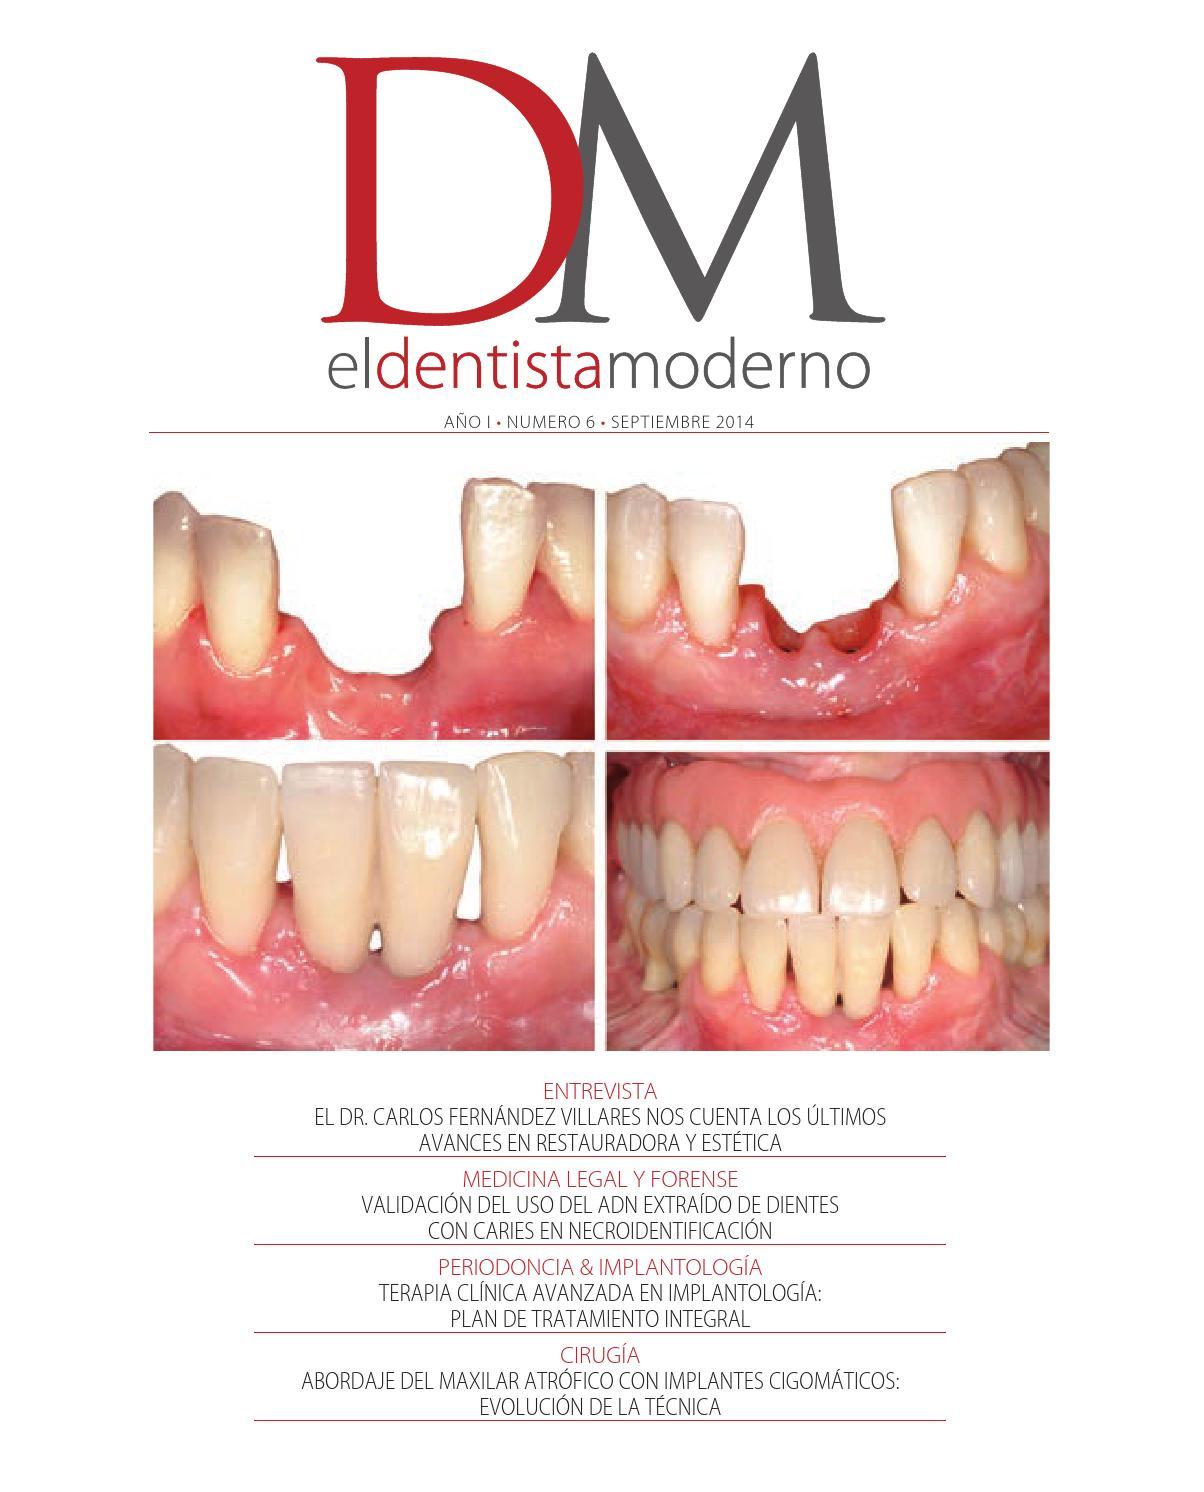 El Dentista Moderno nº 6 by Digital Newspapers S.L. - issuu